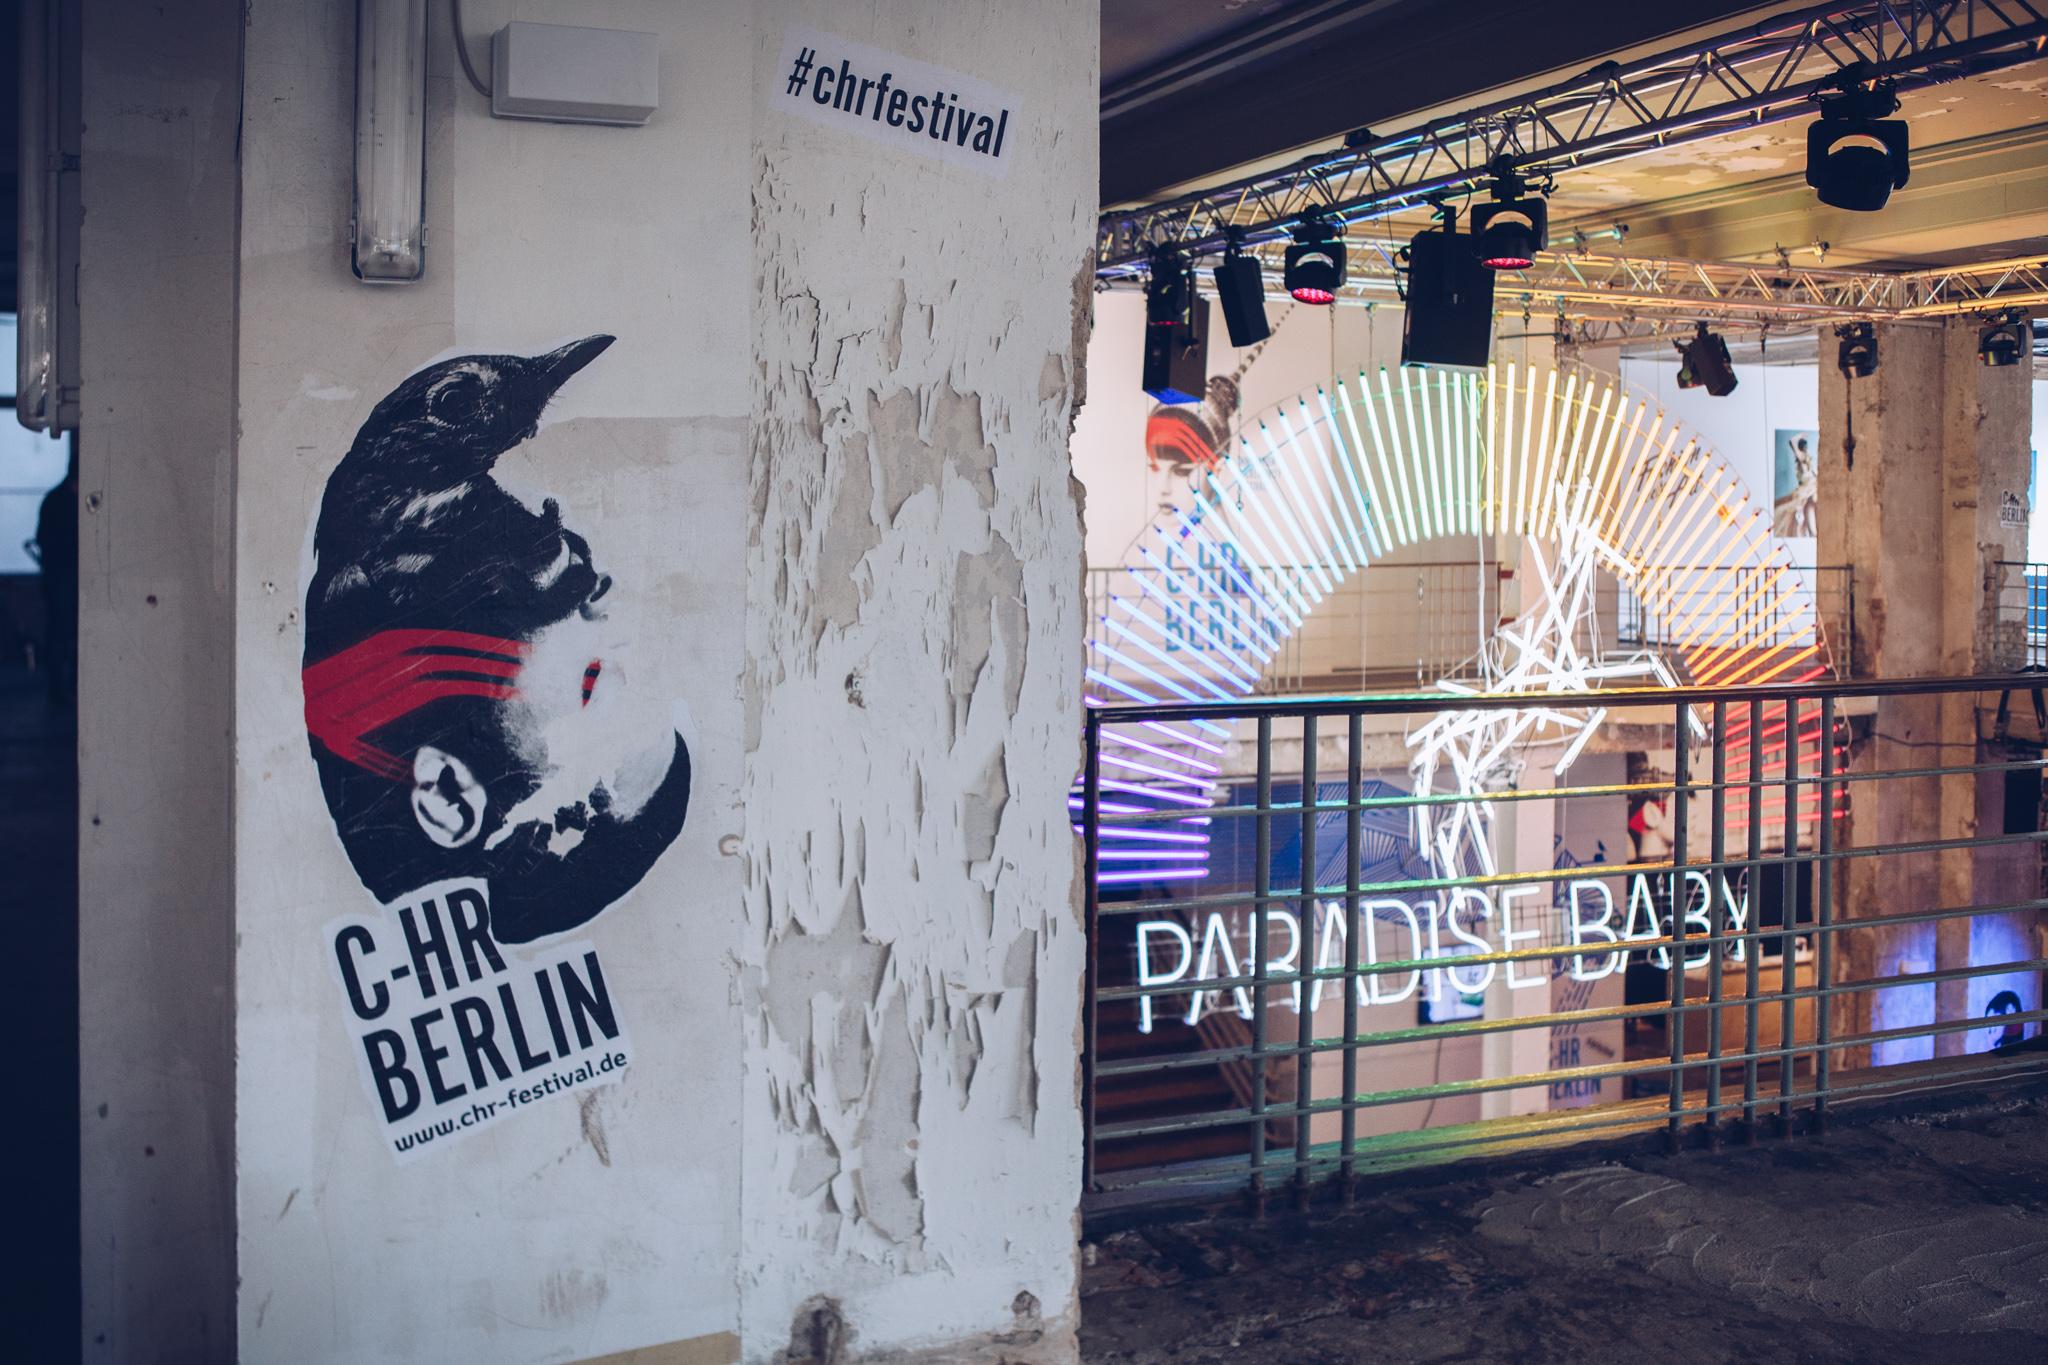 C-HR_BERLIN_Festival-0023-2.jpg